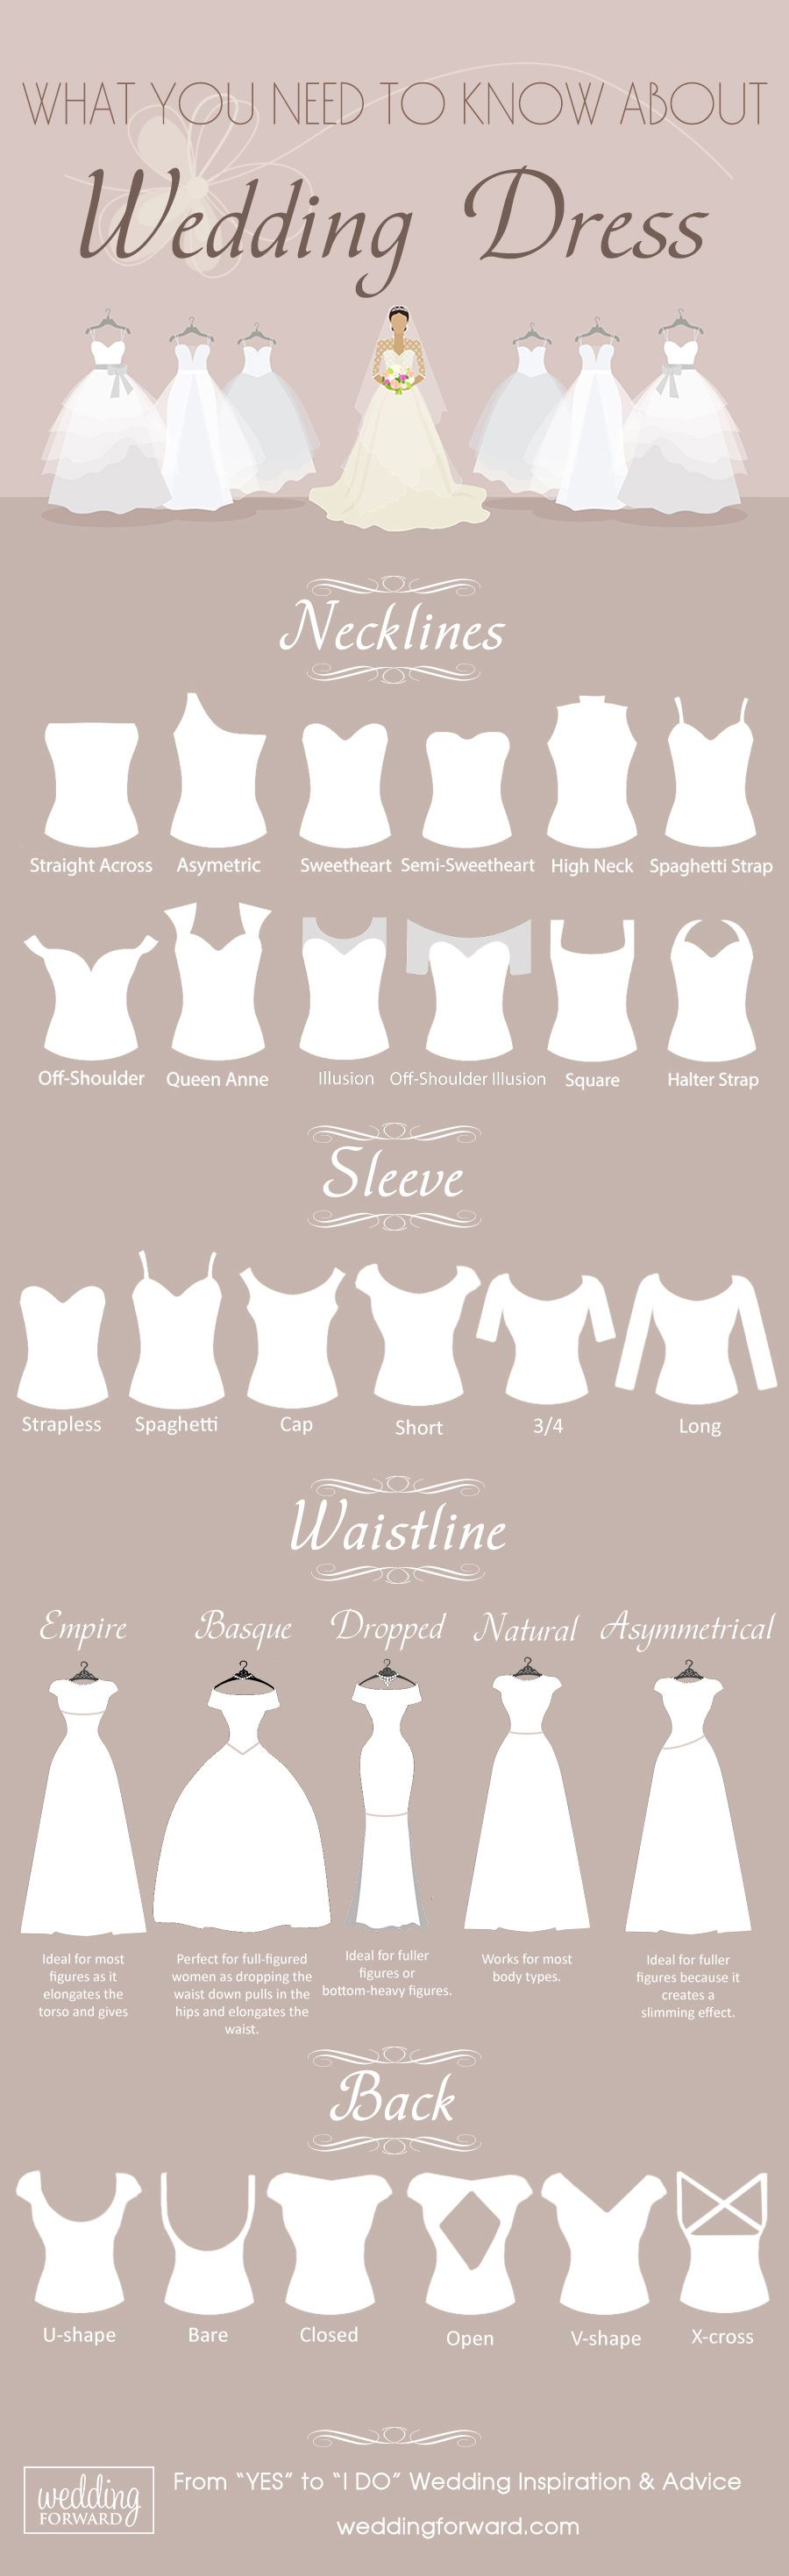 wedding dress guide necklines sleeve waistline back | Wedding ...